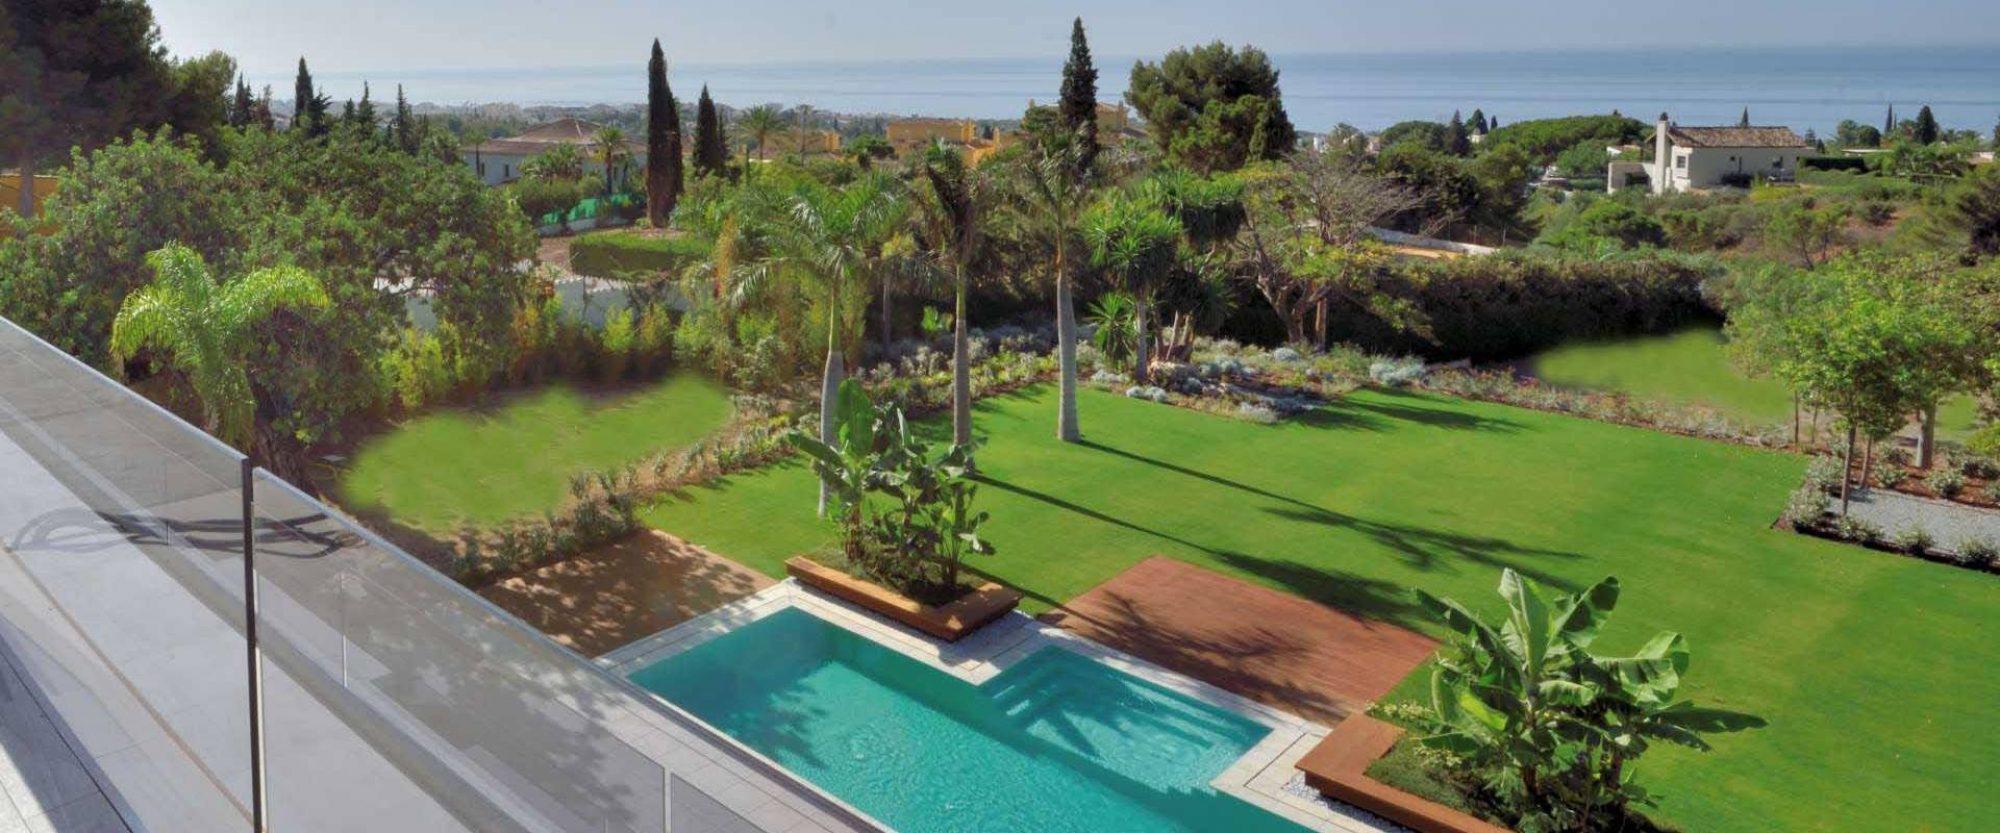 roof terrace views from Cascada de Camojan Villa for sale